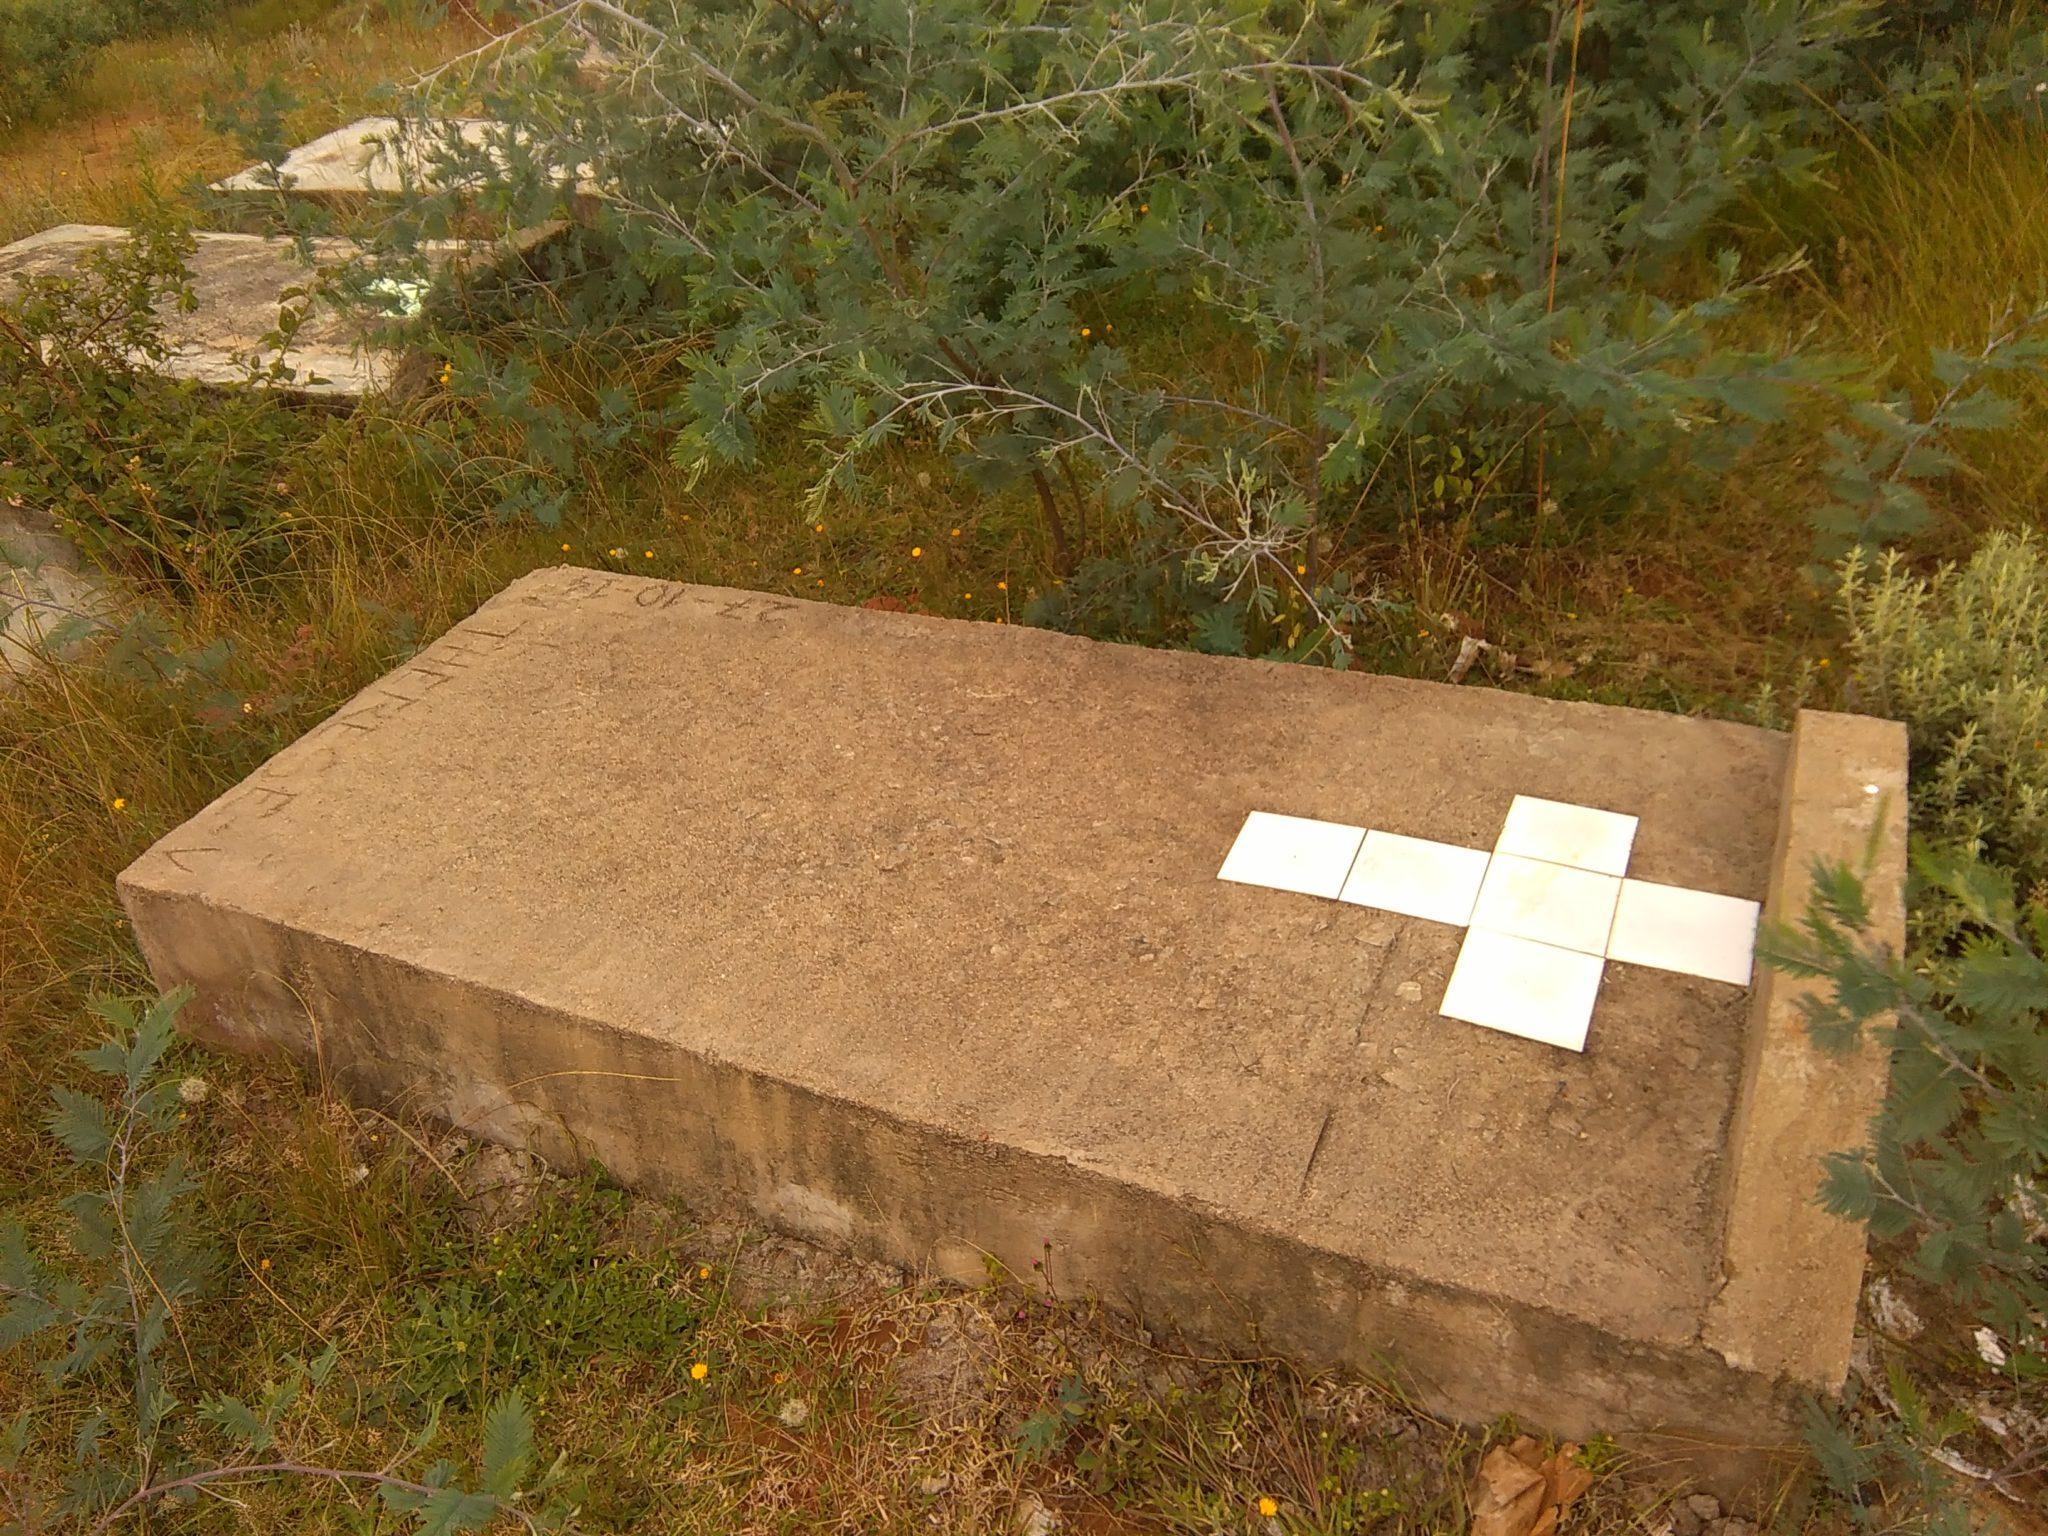 Cmentarz katolicki w Morondavie, Madagaskar